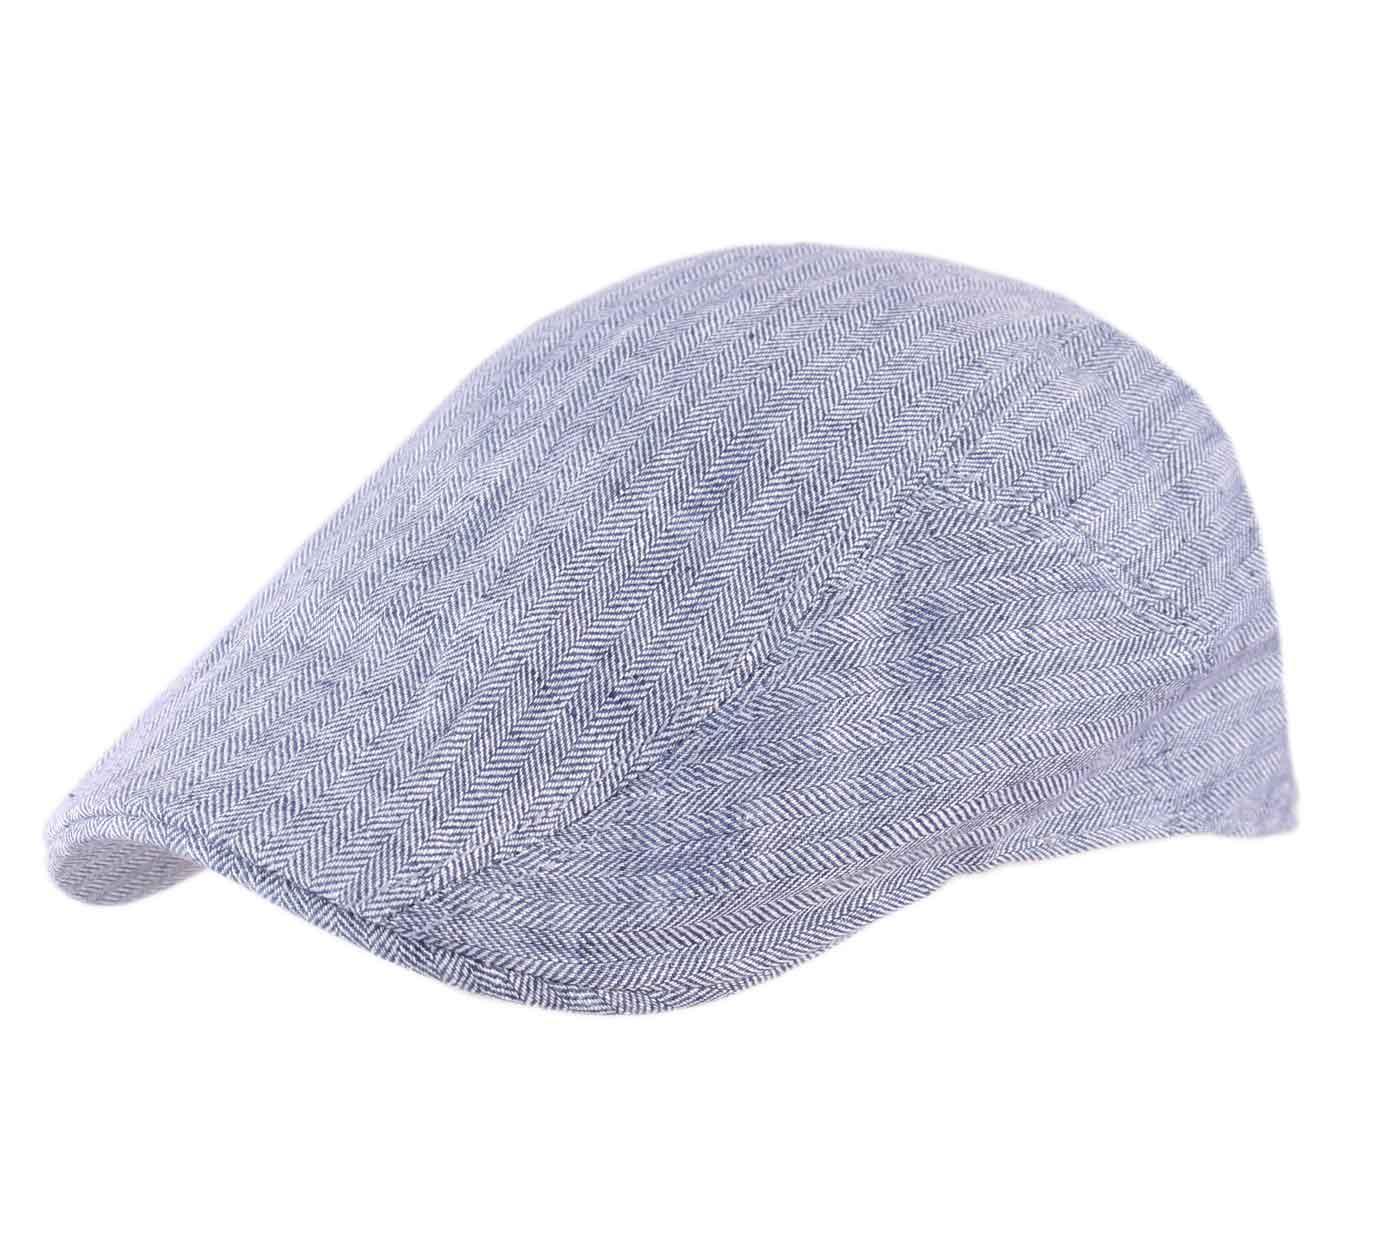 309ea5a0b5cb7a Ivy Cap Linen Fischgrat - Caps Stetson